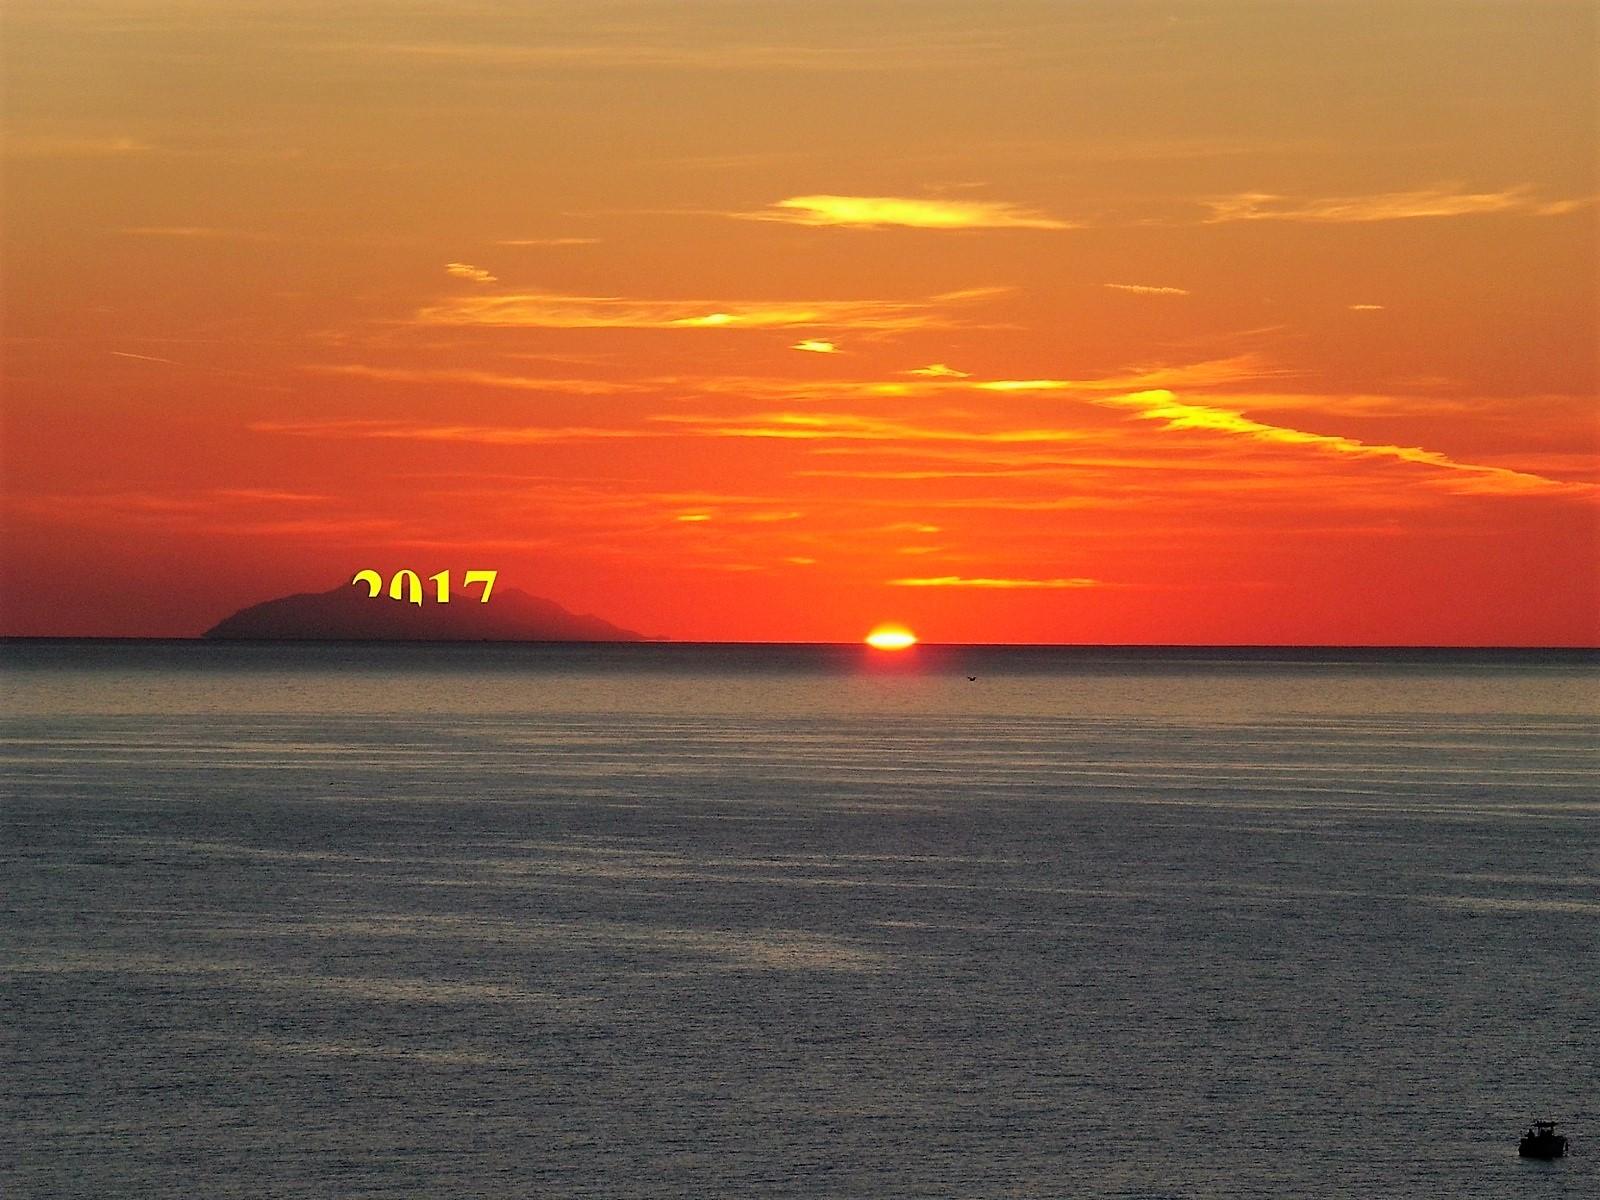 photo pj 2017 se lève